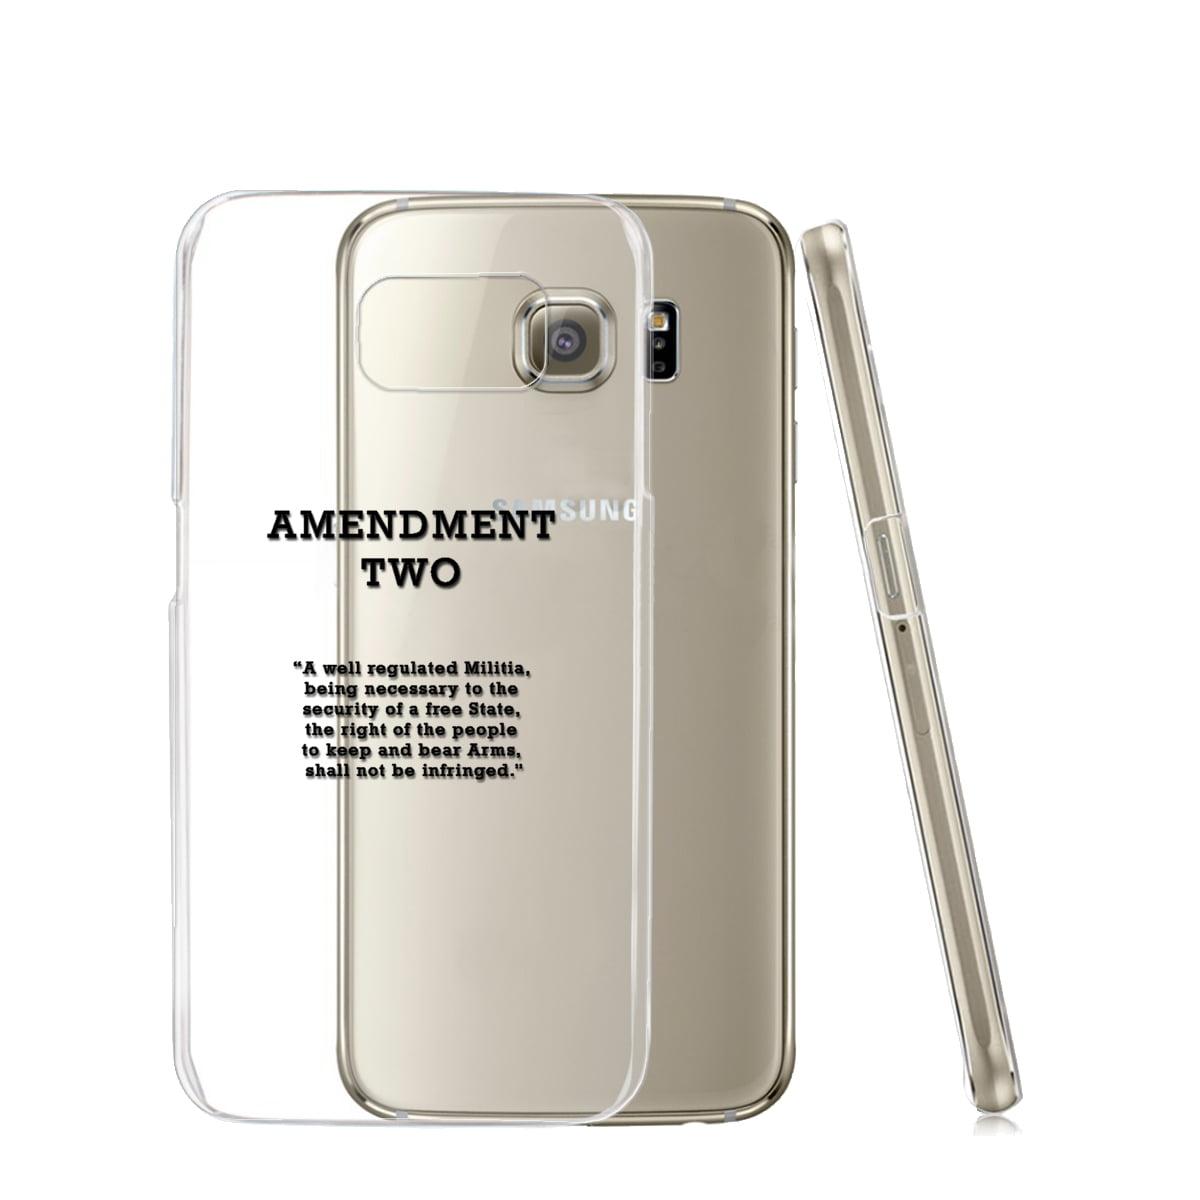 KuzmarK™ Samsung Galaxy S6 Edge Clear Cover Case - Amendment Two